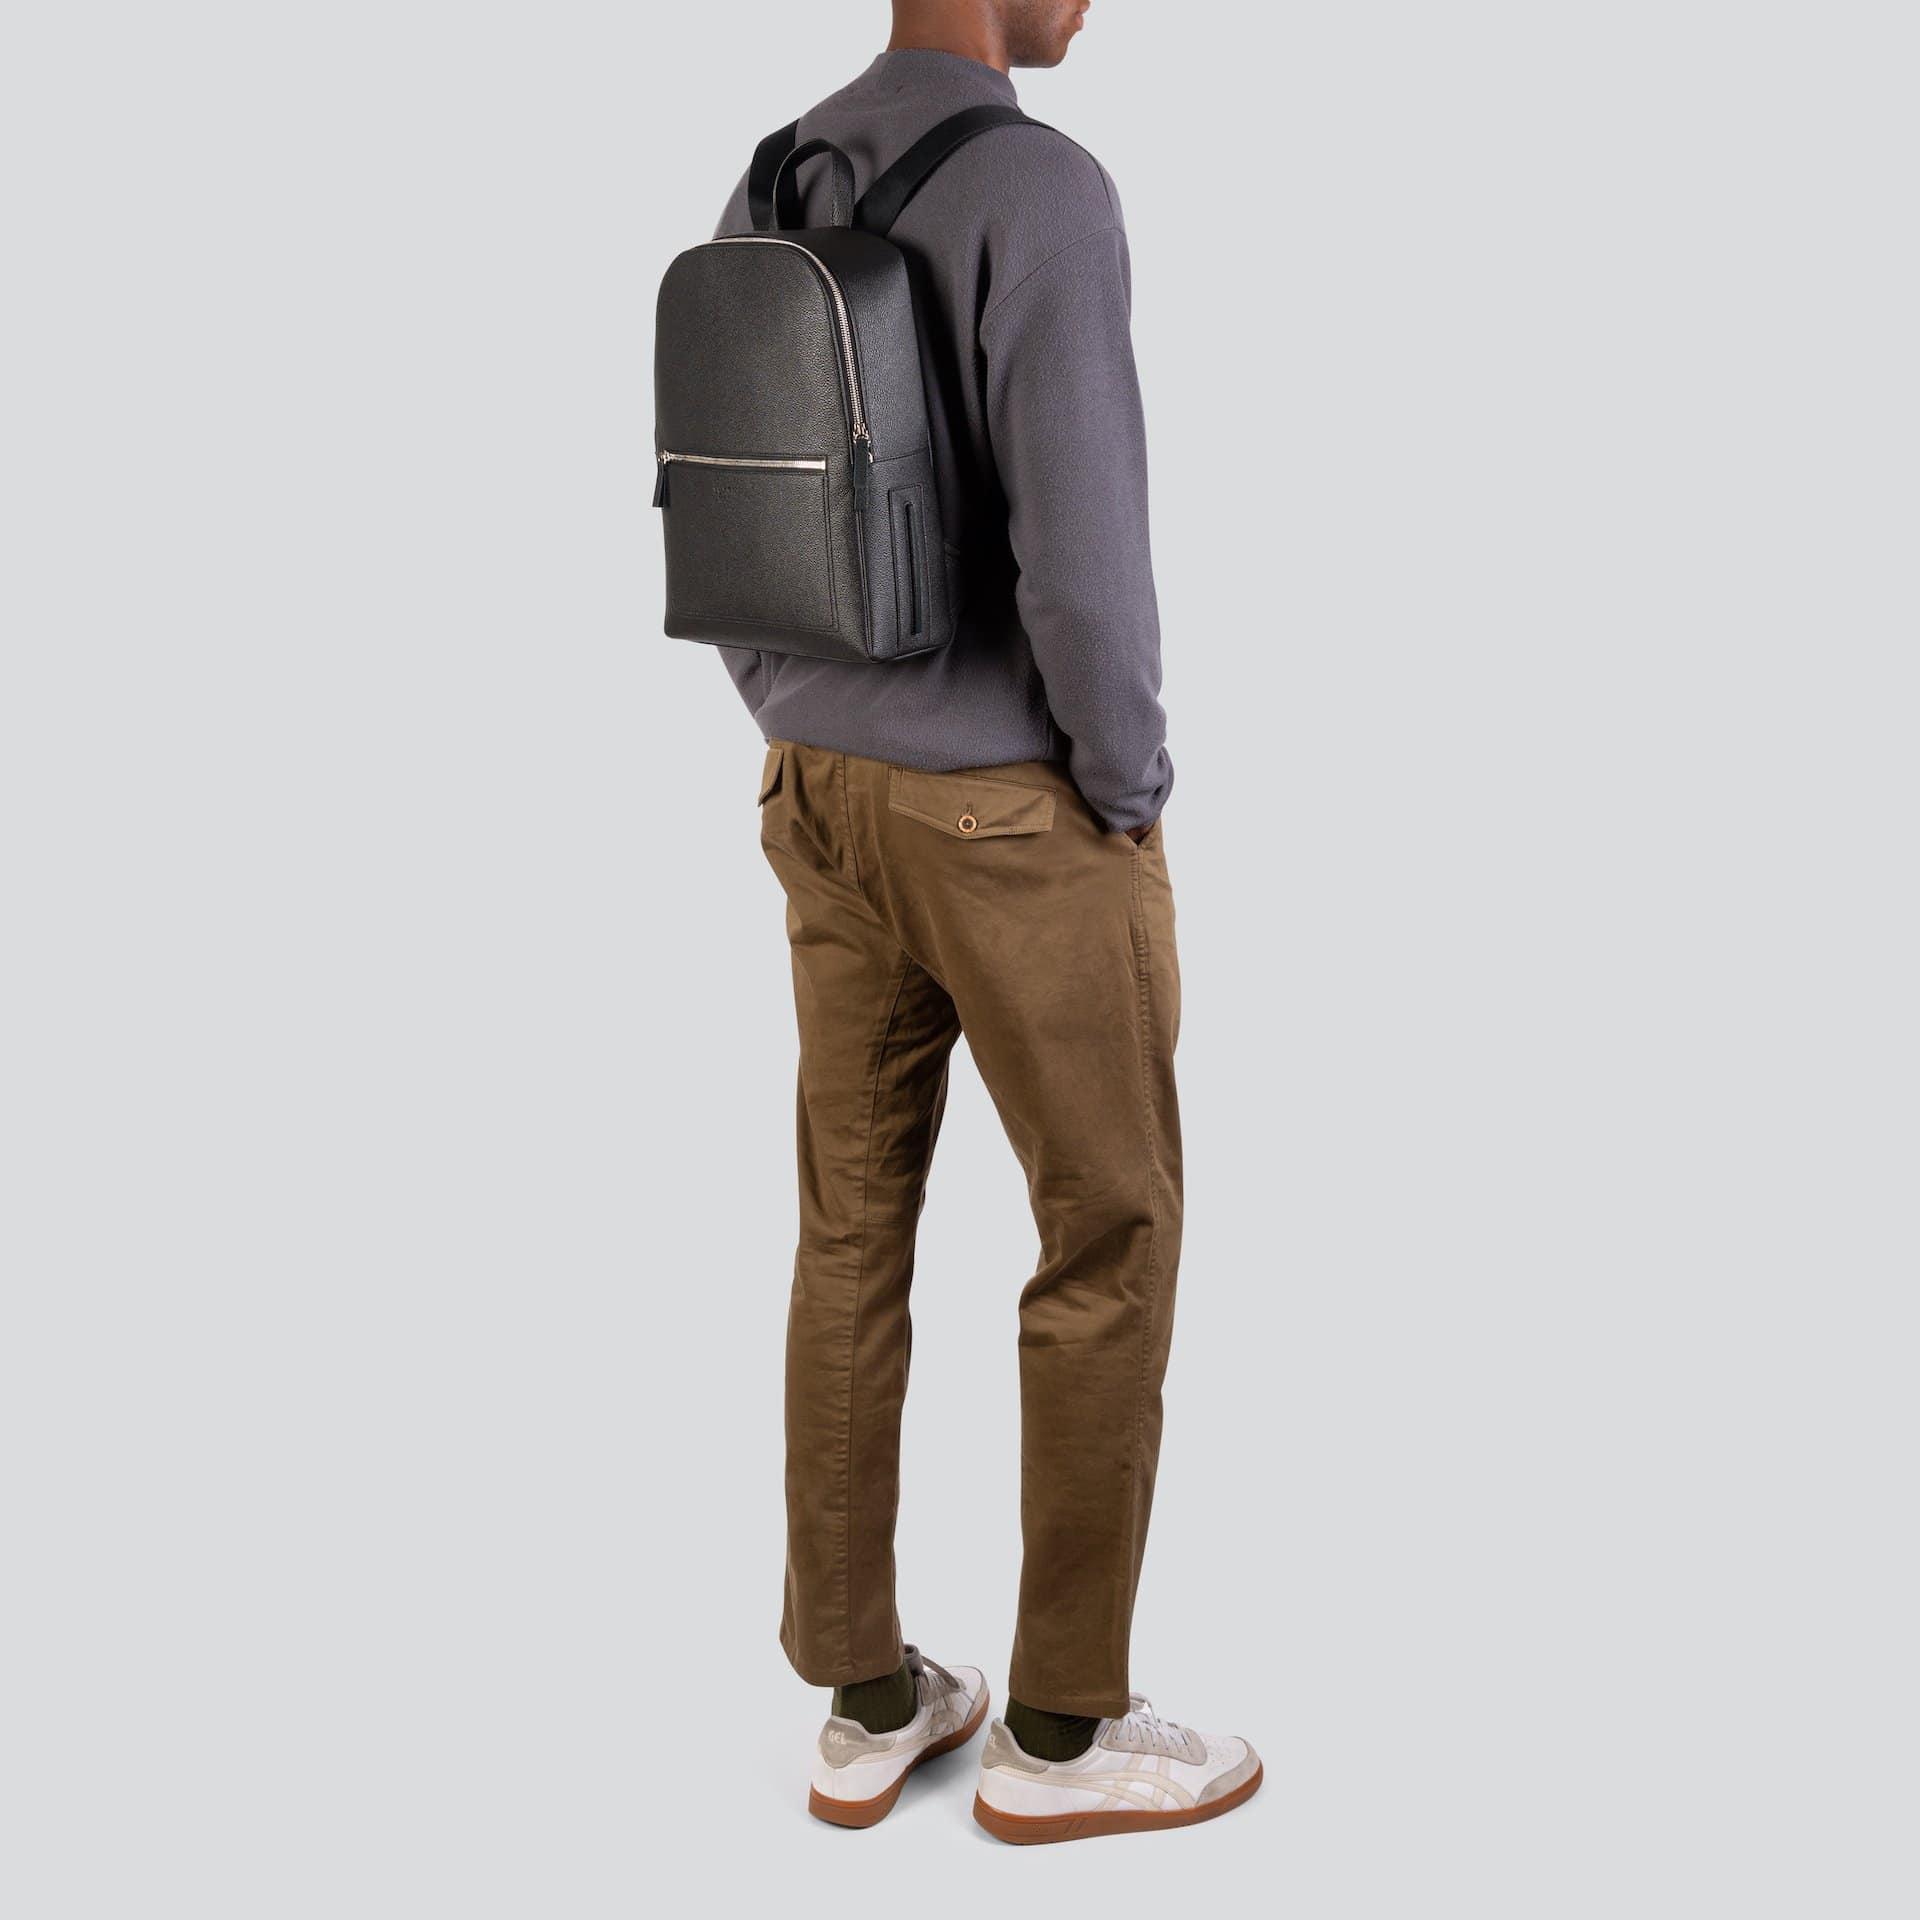 Luxtra Farrell Apple Leather Vegan Backpack   Black